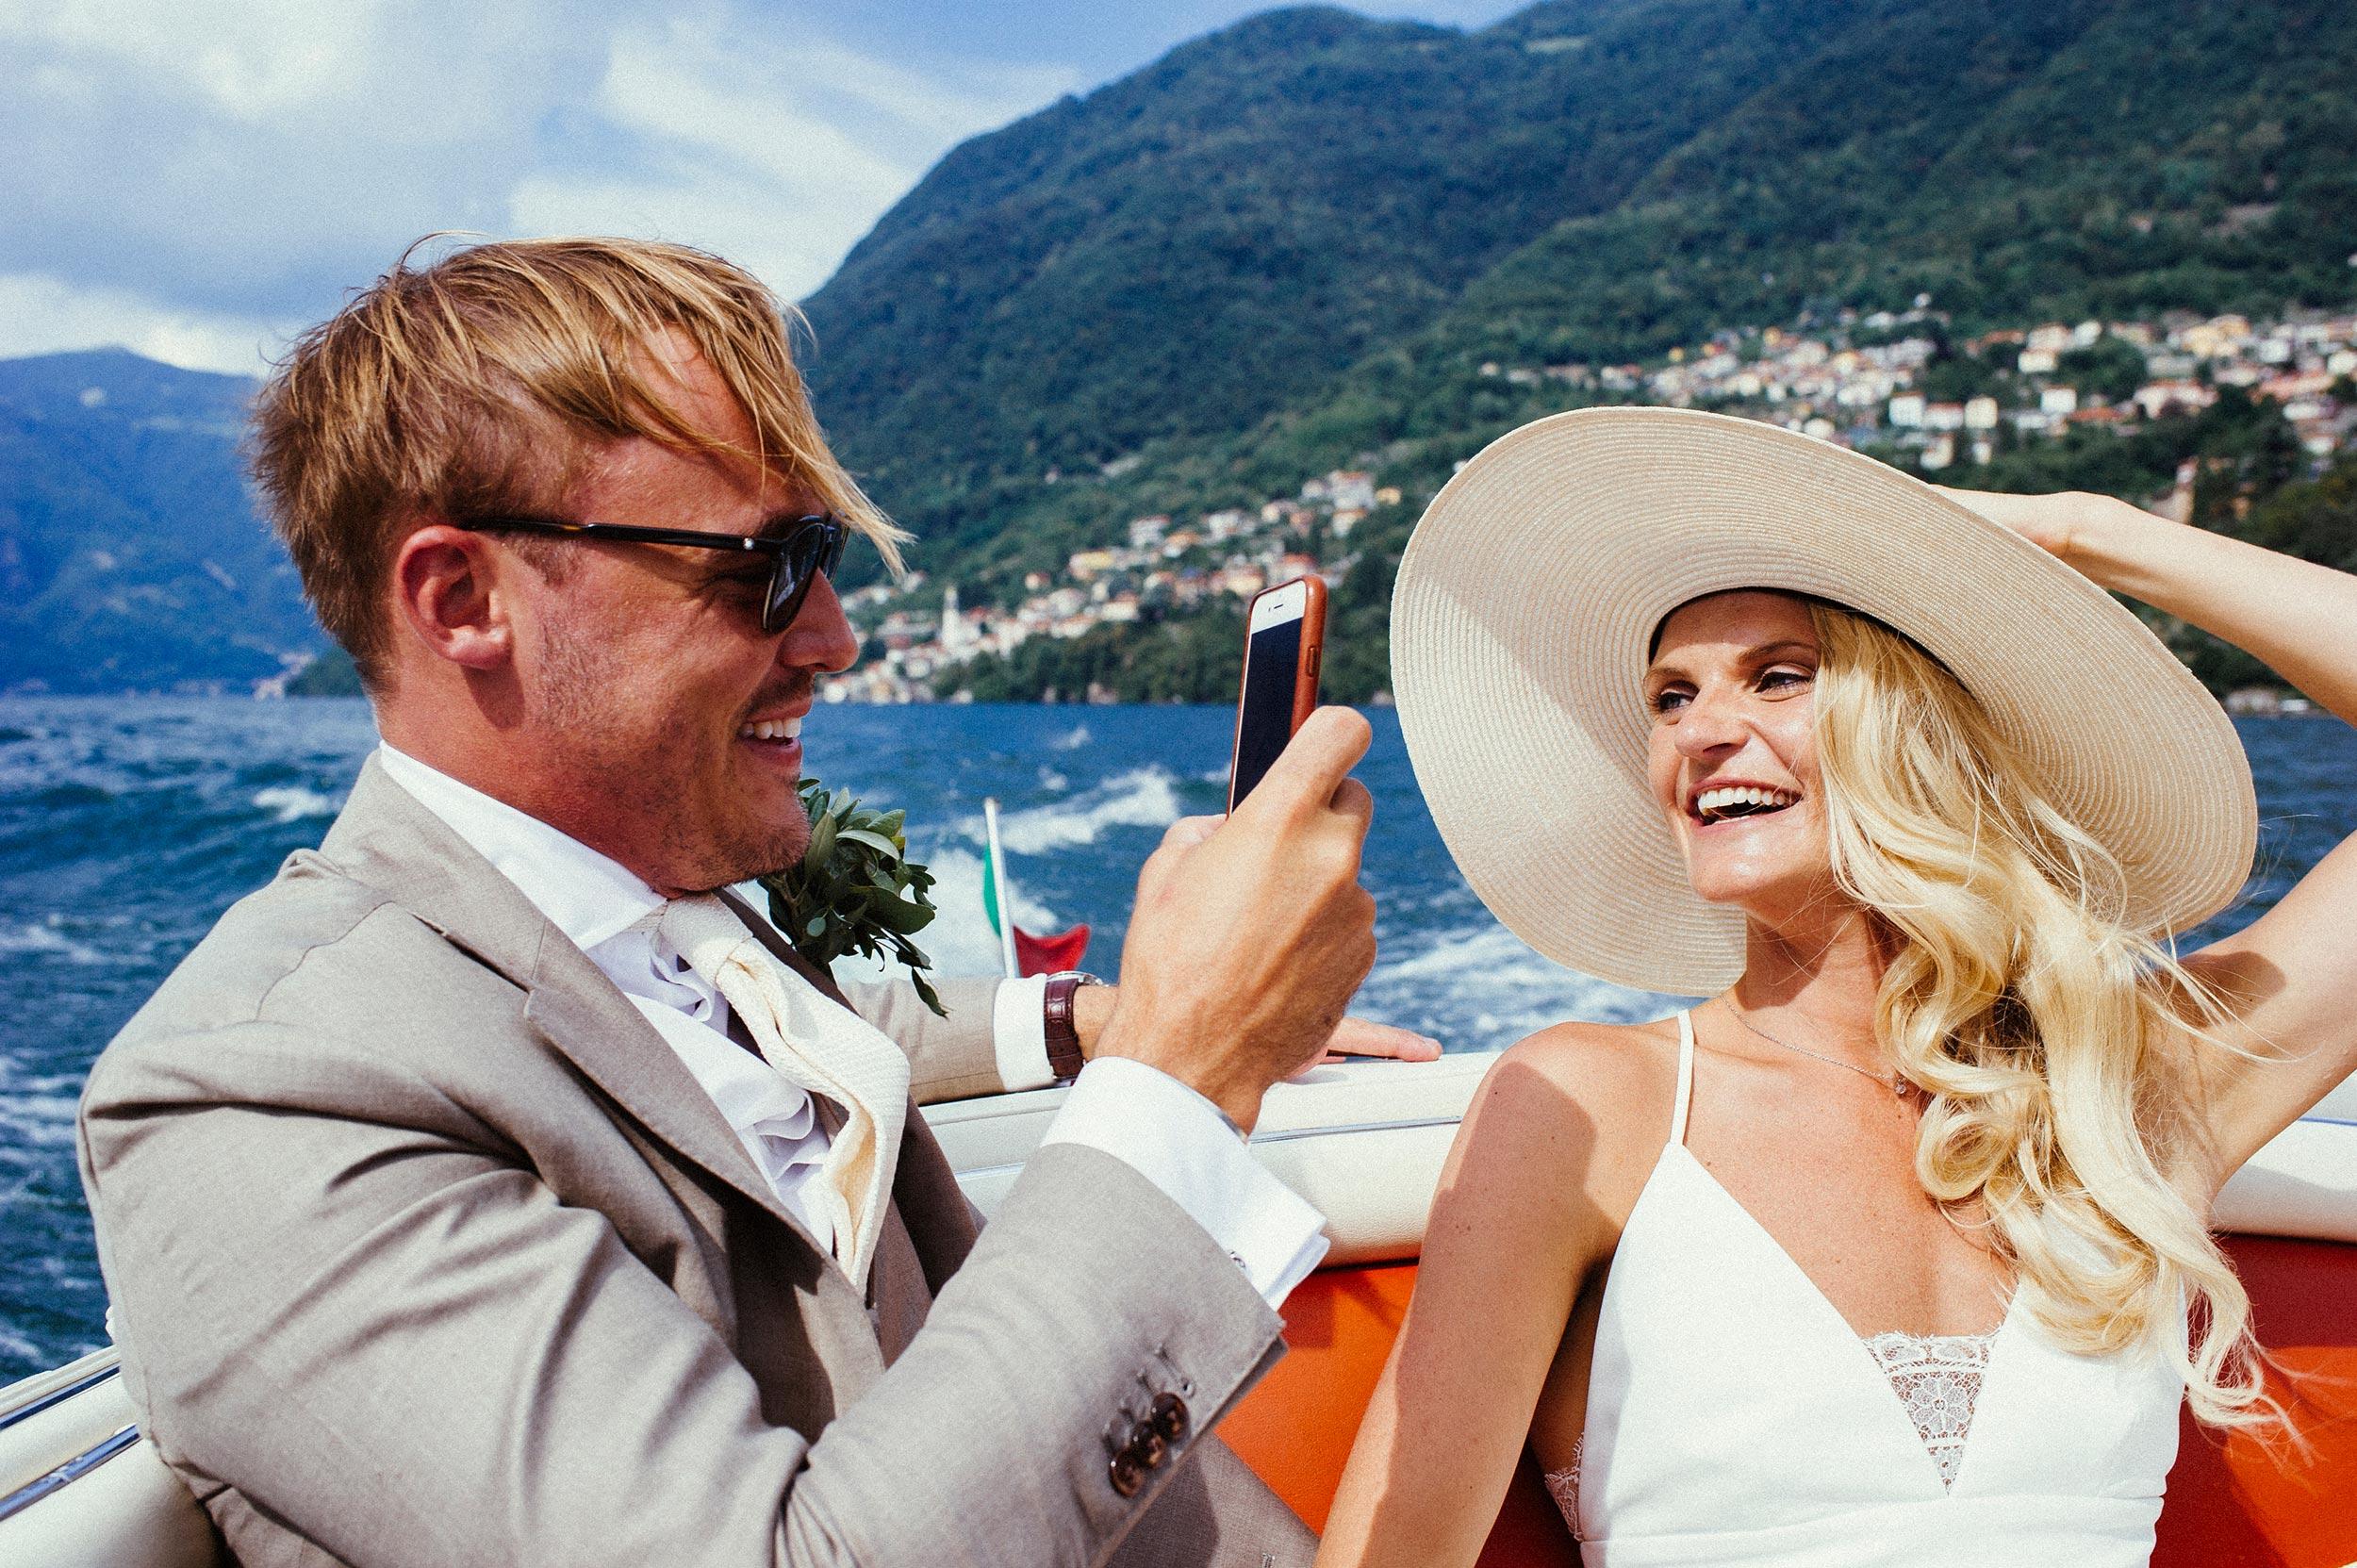 2018-Villa-Regina-Teodolinda-Lake-Como-Wedding-Photographer-Italy-Alessandro-Avenali-159.jpg